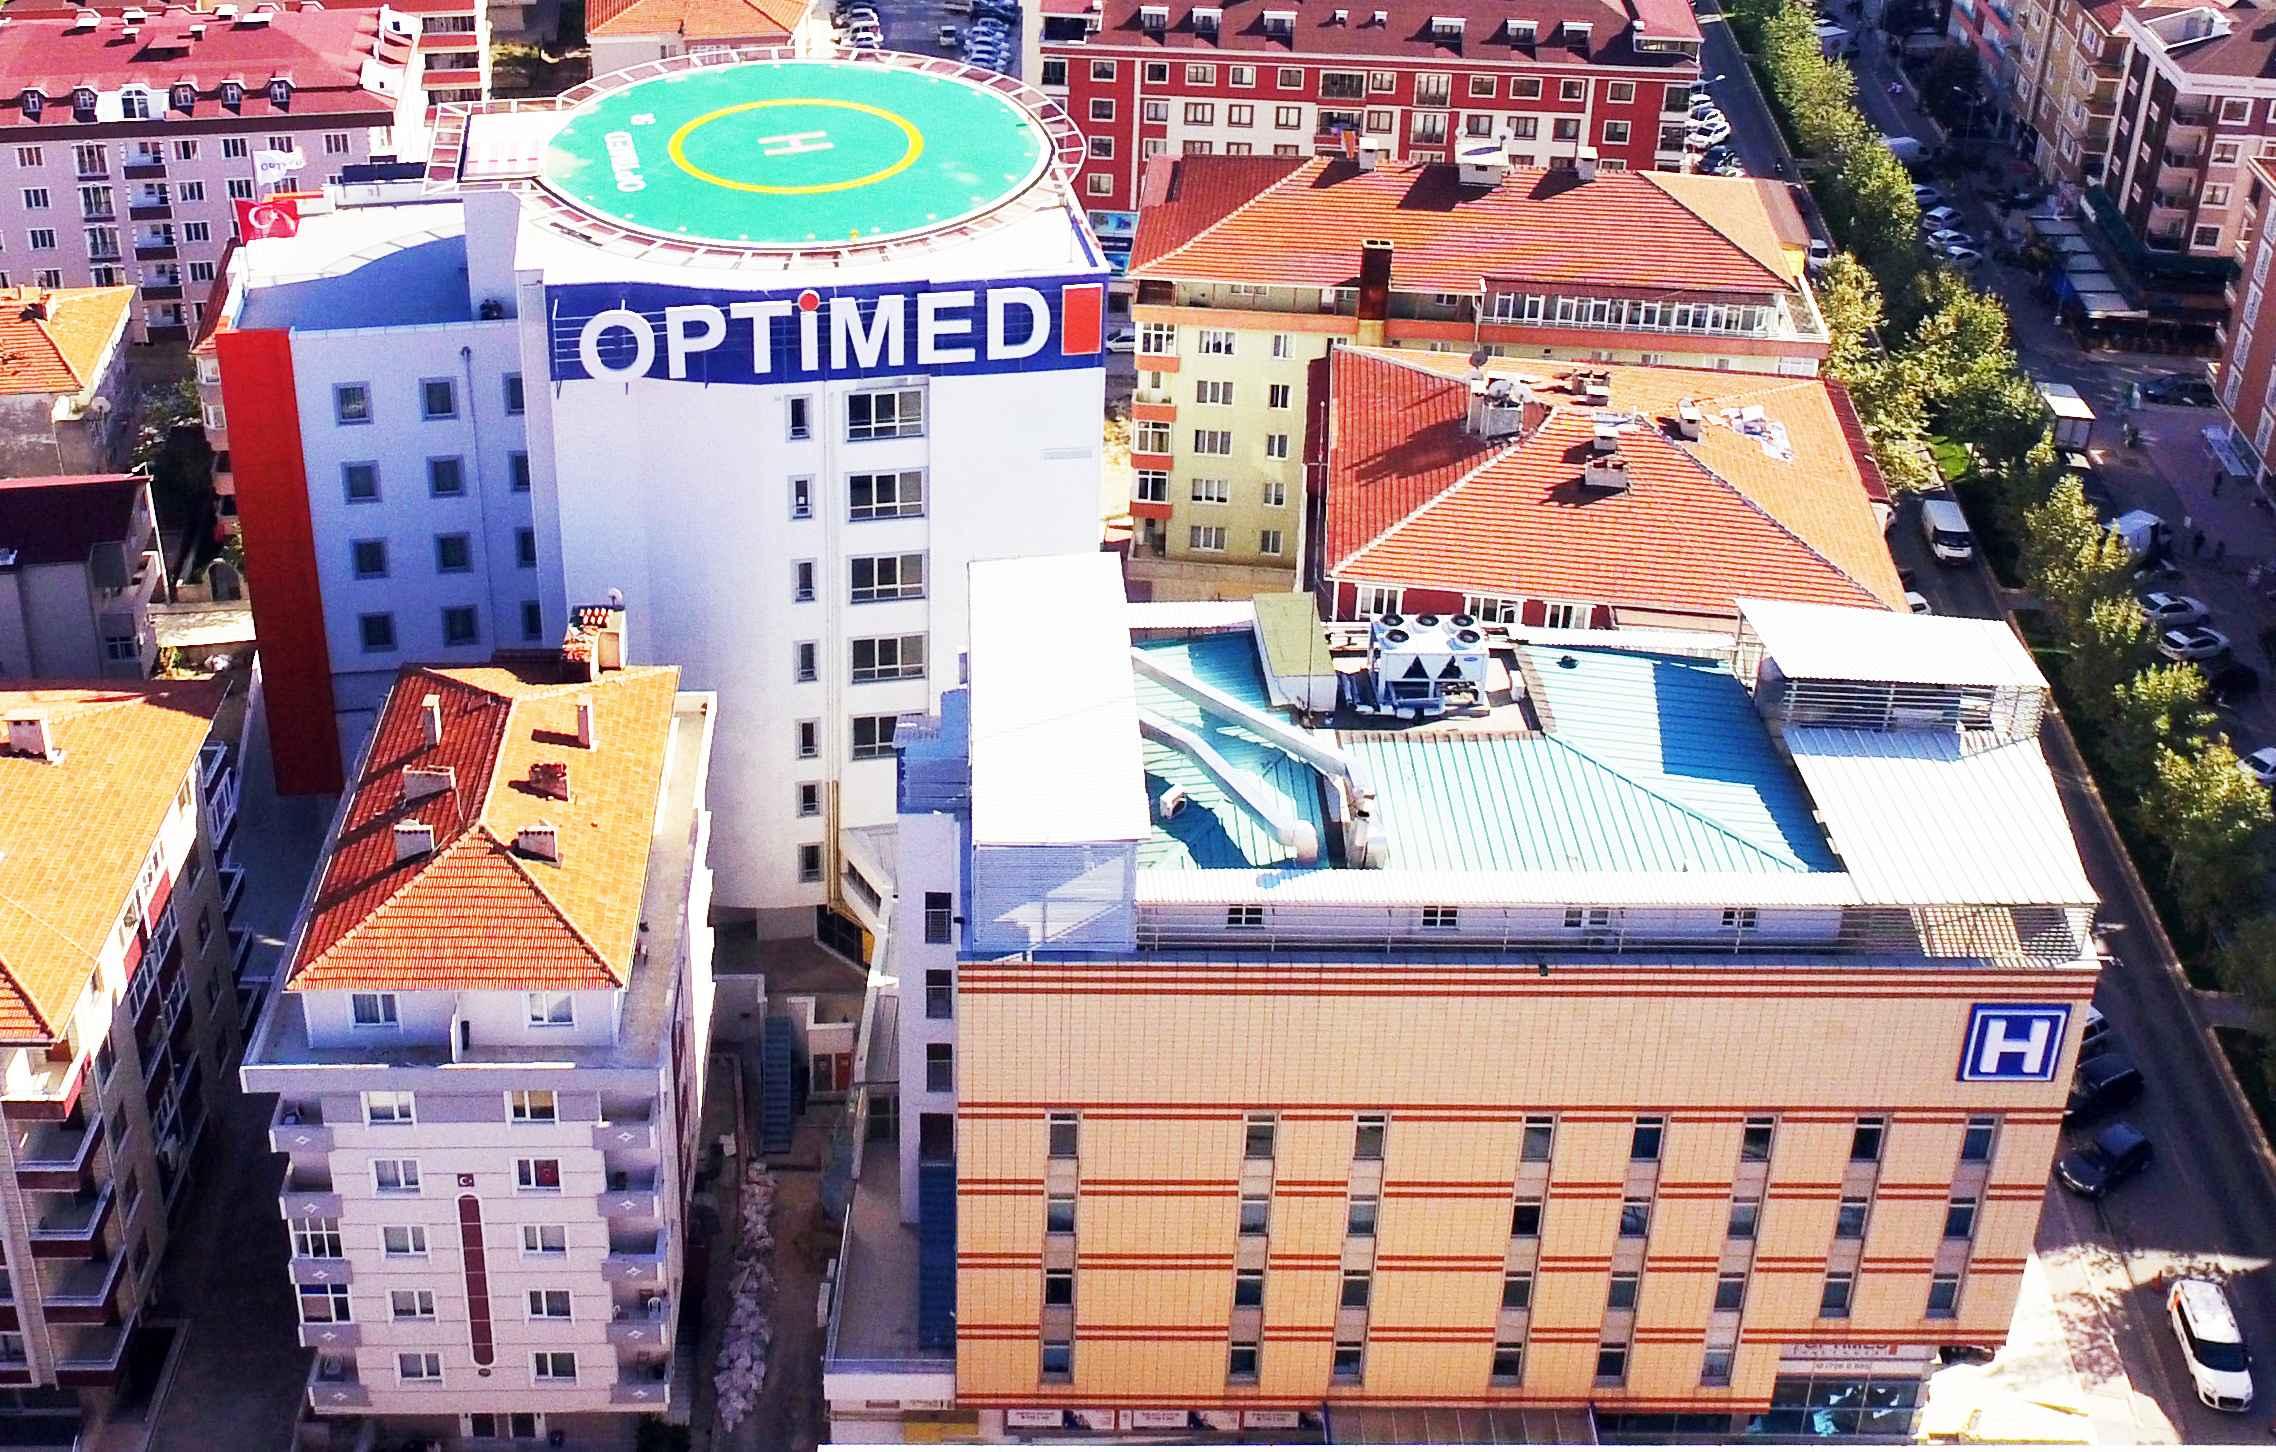 Optimed Hospital Turkey